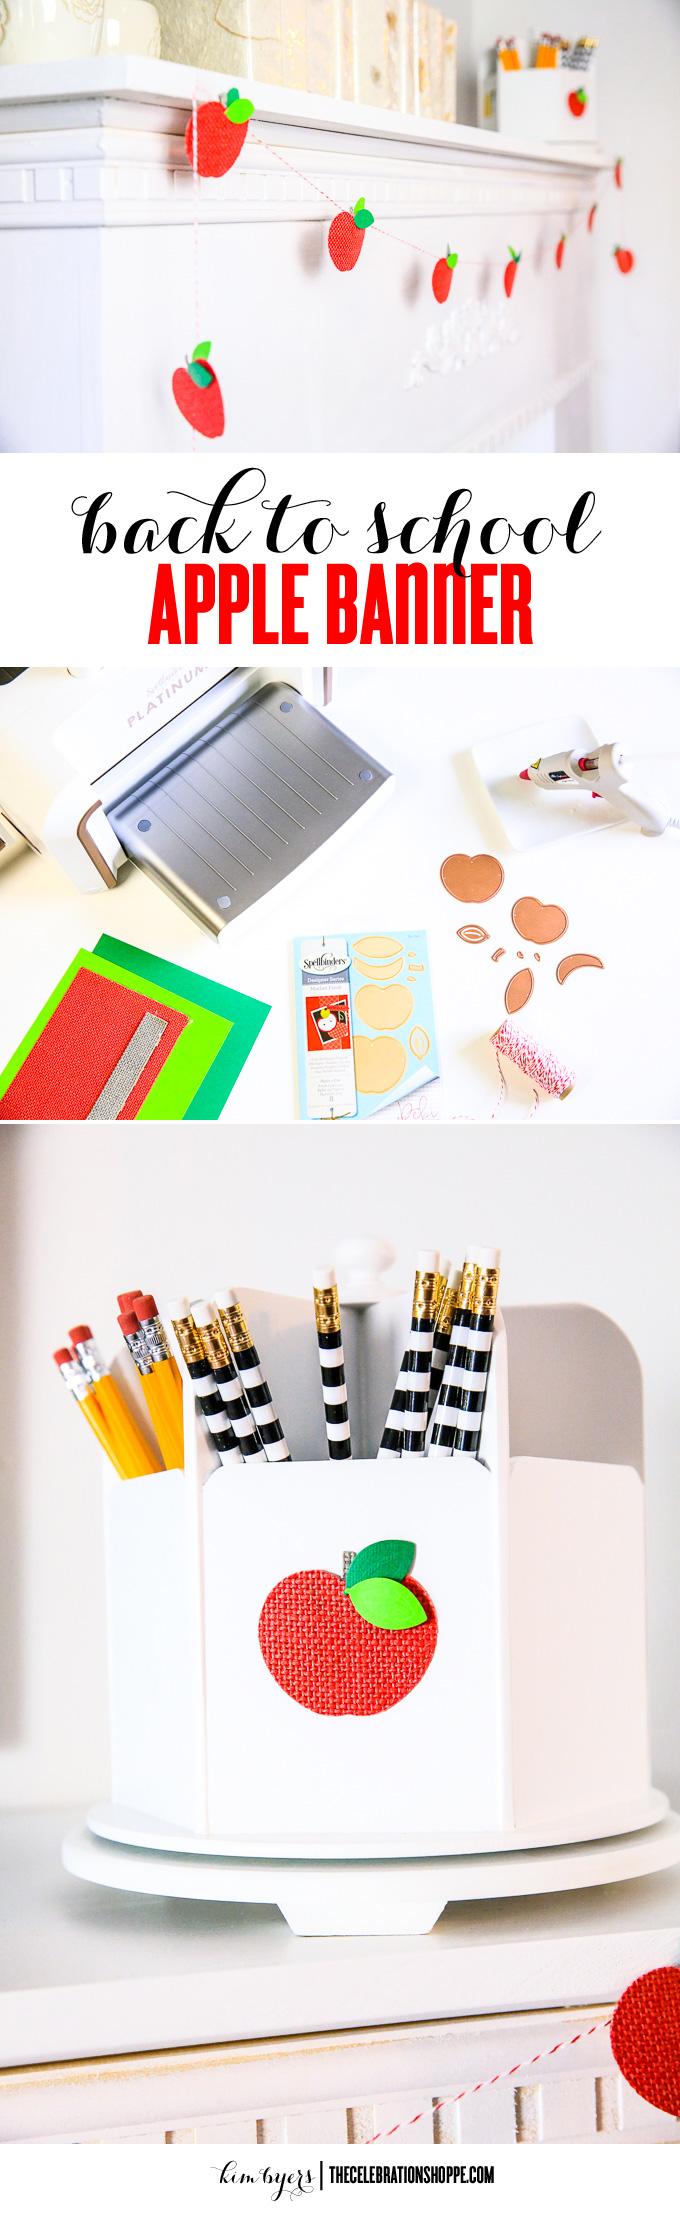 Back To School Apple Decorations   Kim Byers